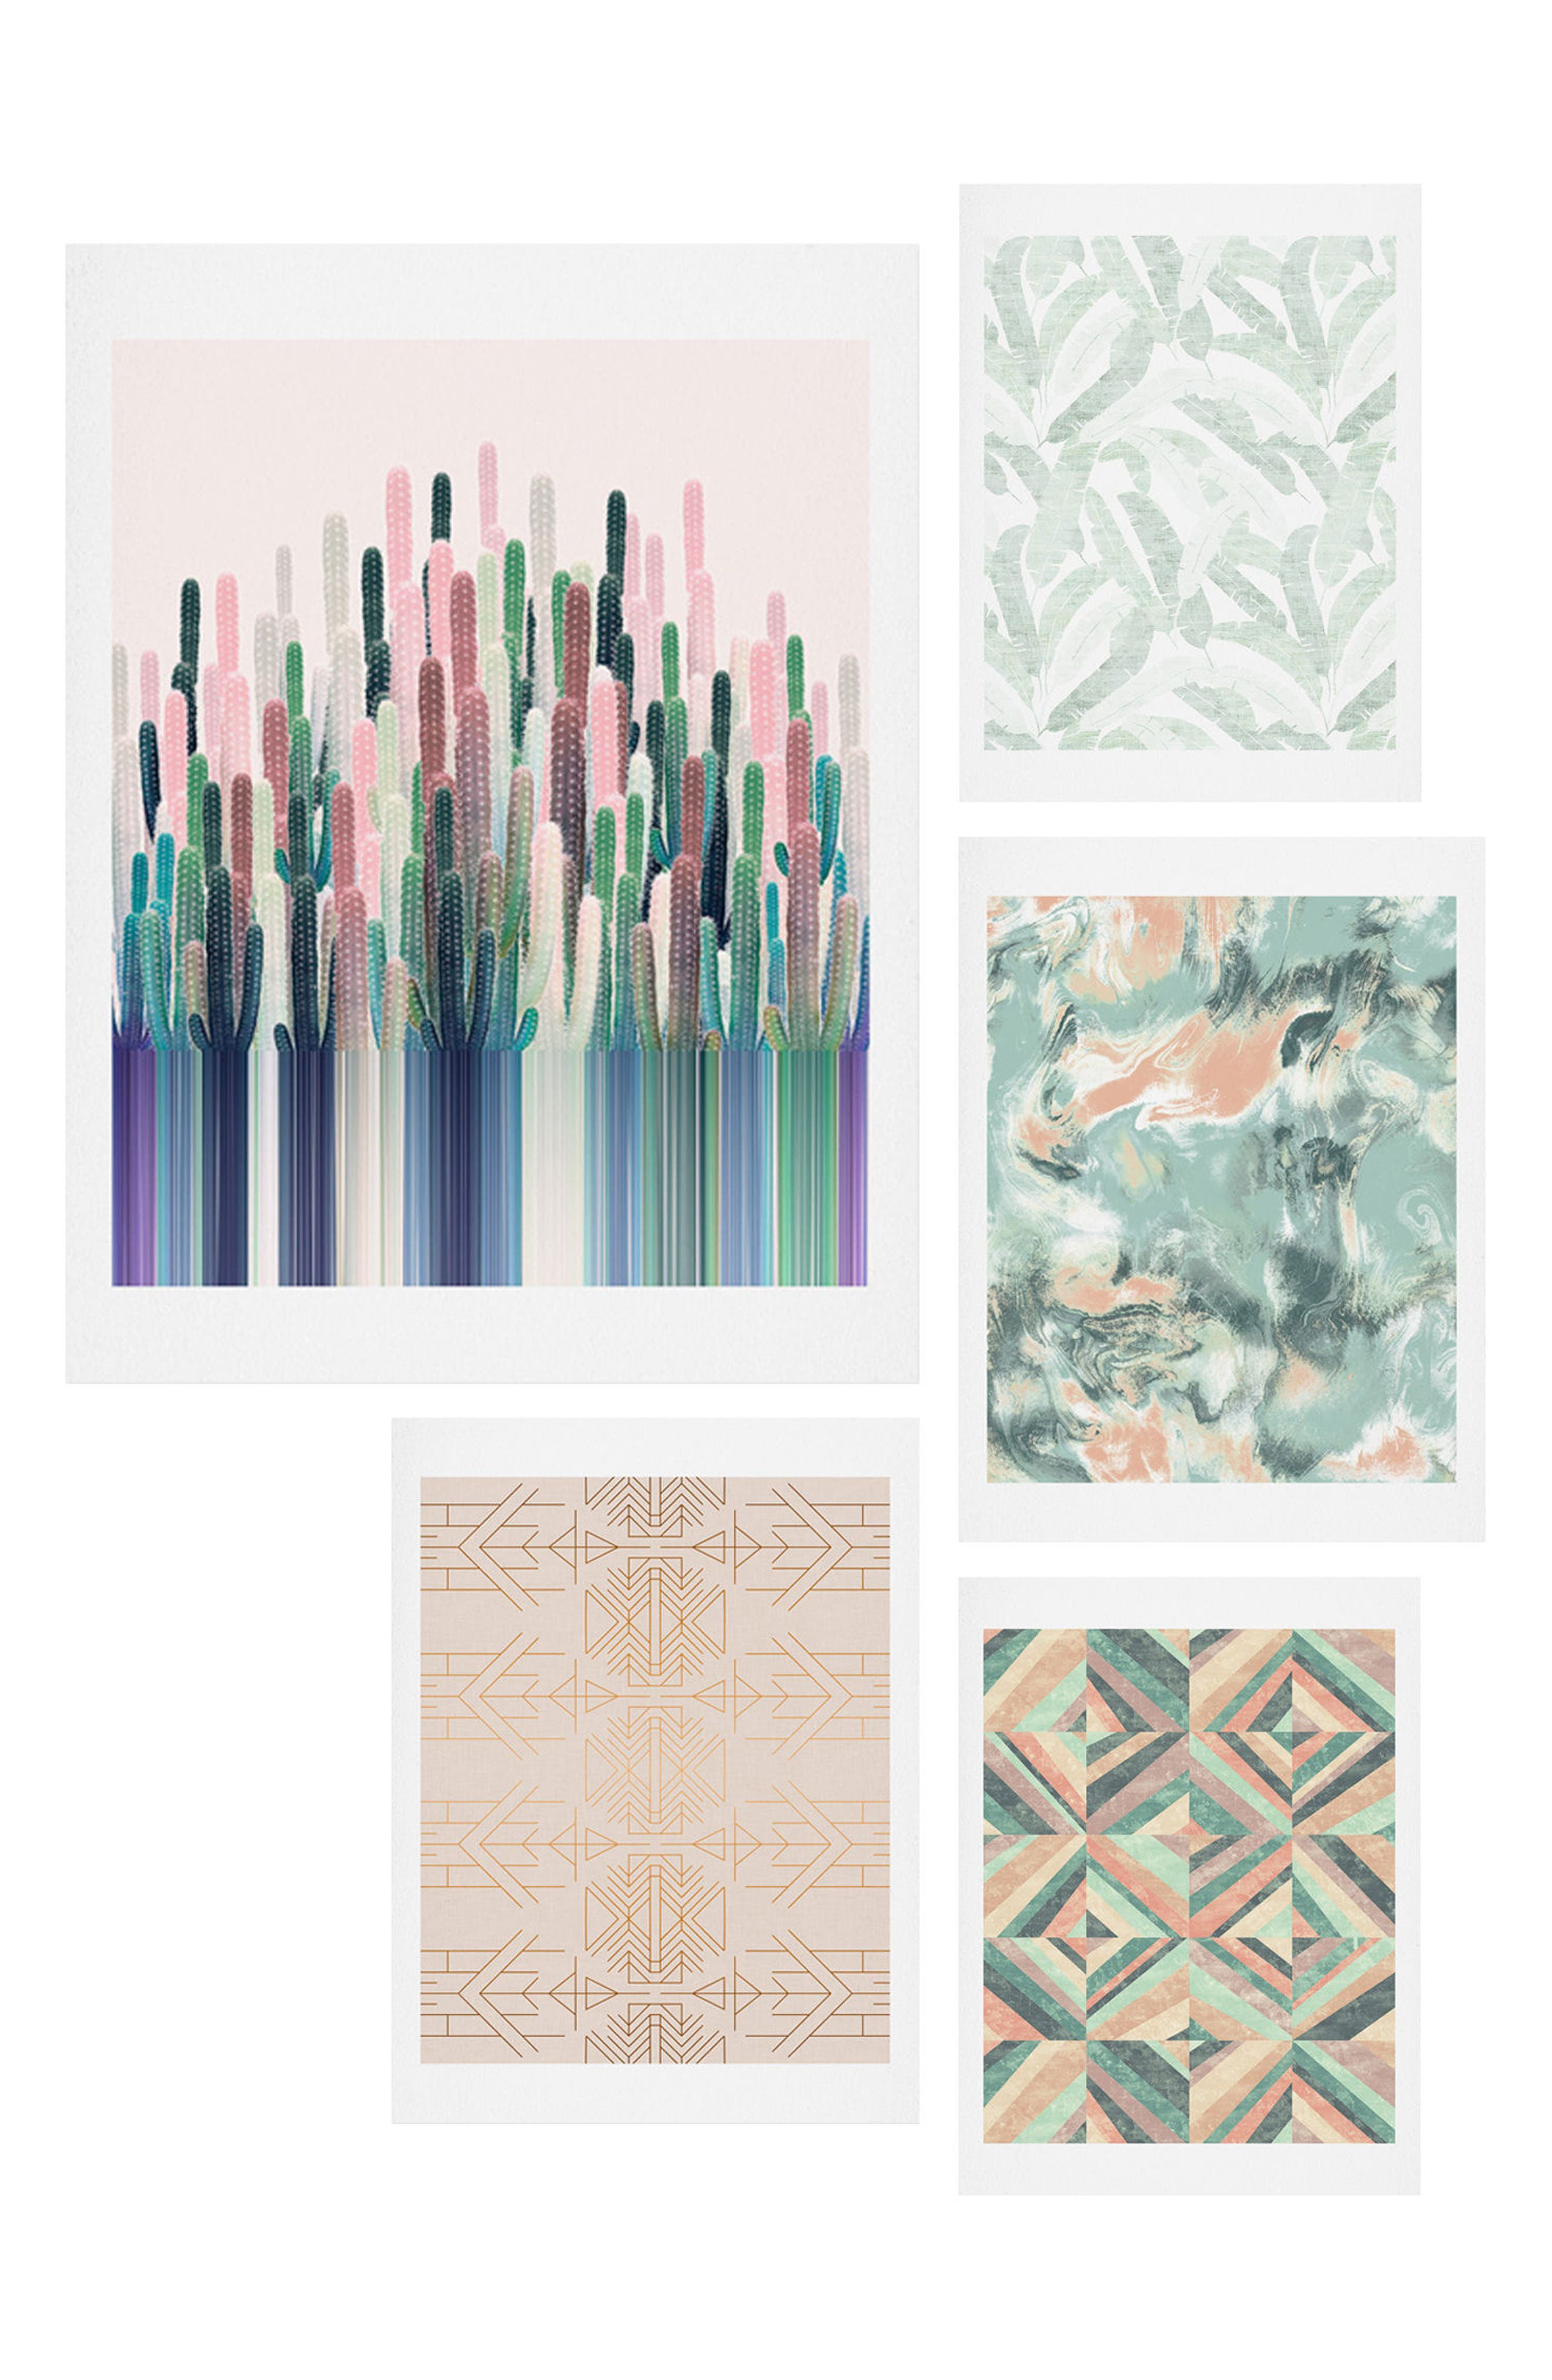 DENY DESIGNS, Matcha Blush Five-Piece Gallery Wall Art Print Set, Main thumbnail 1, color, CORAL AND GREEN